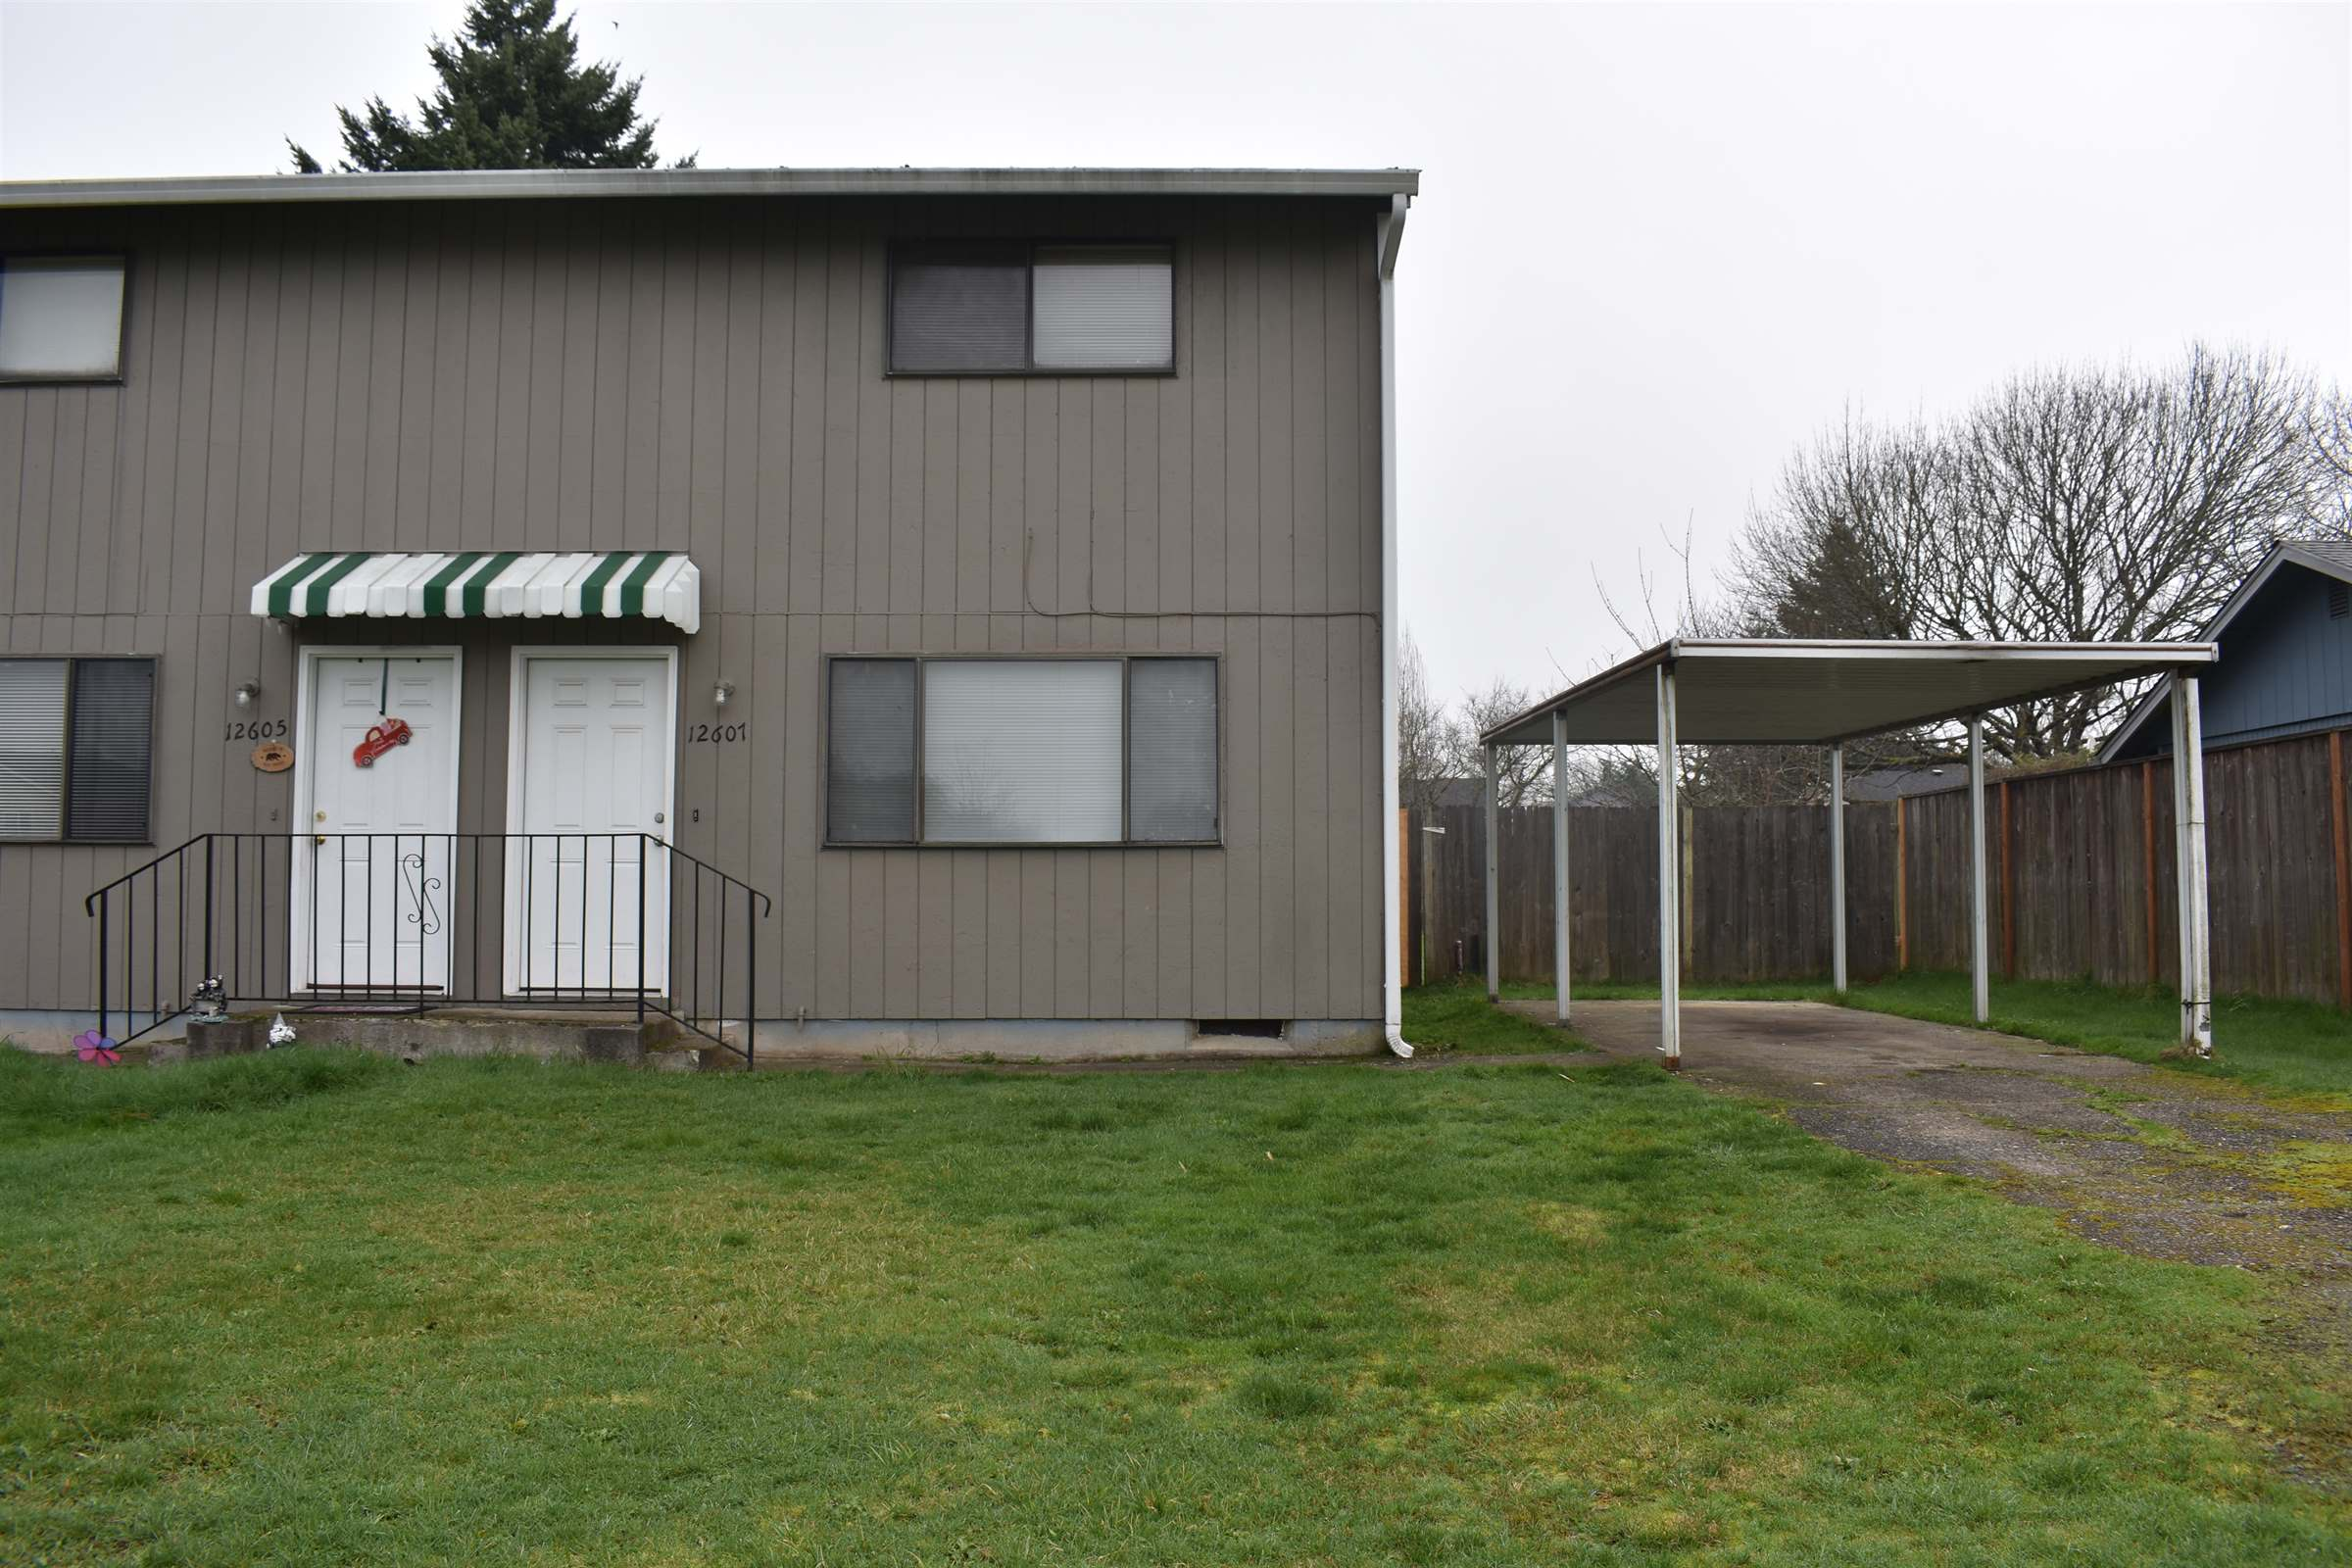 12605 NE 44th St., Vancouver, WA 98682